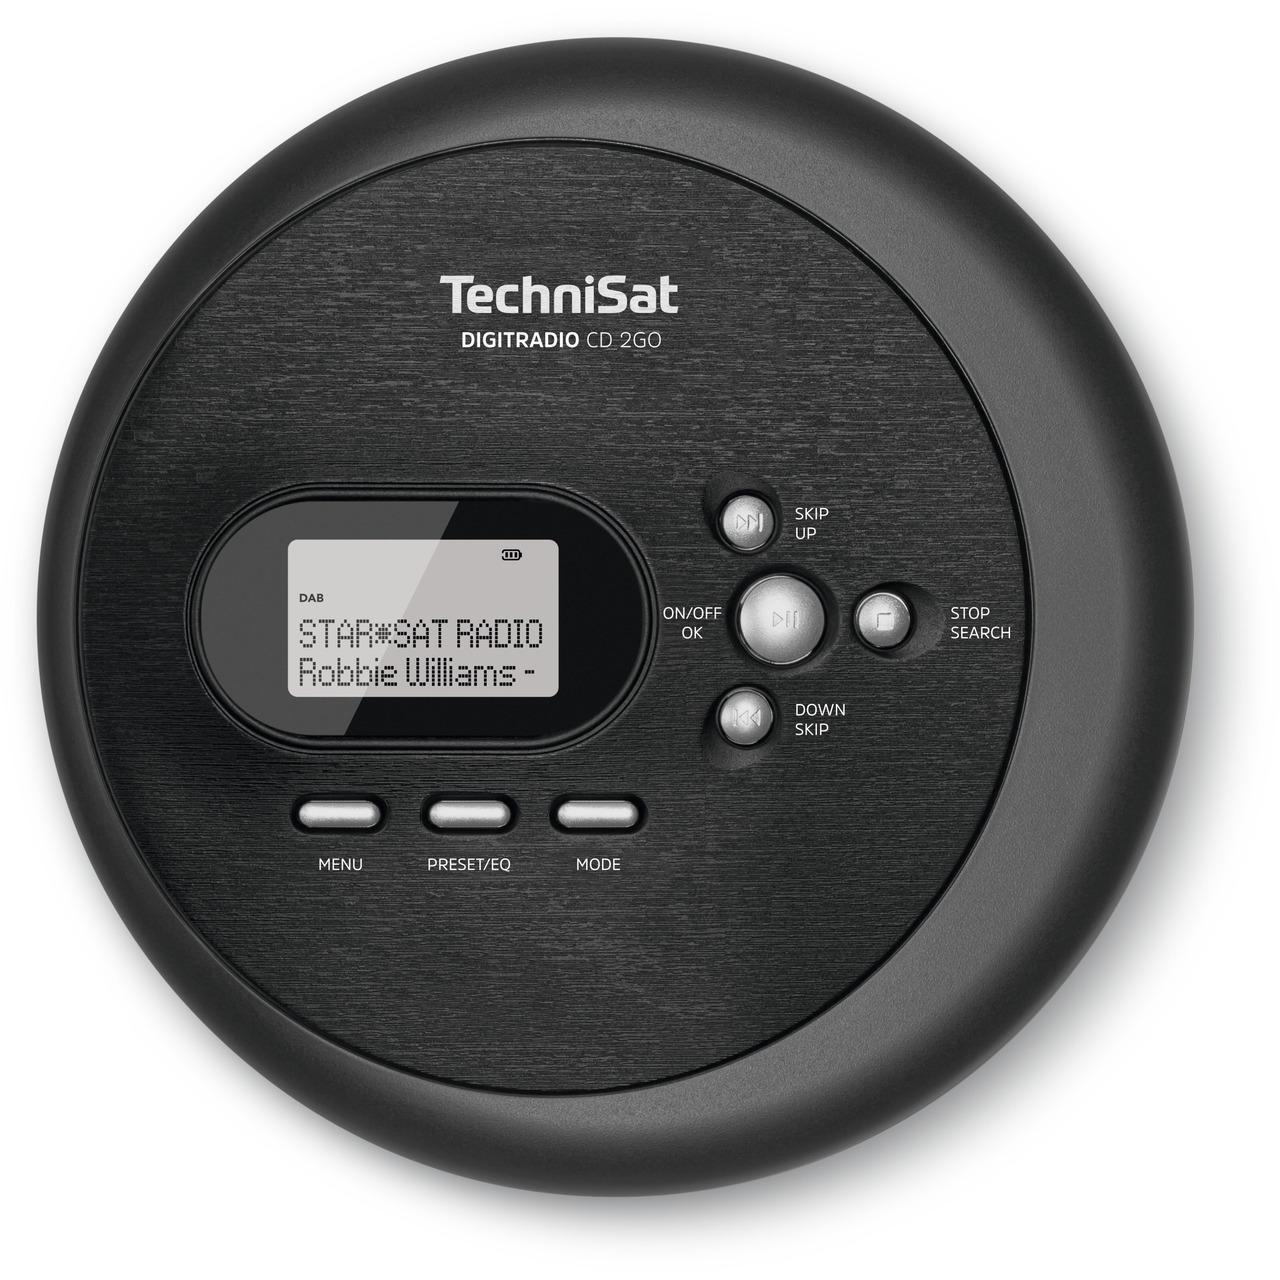 TechniSat Portabler CD-Player DIGITRADIO CD 2GO- mit DAB+ und UKW-Radio- inkl- Kopfhund-246 rer